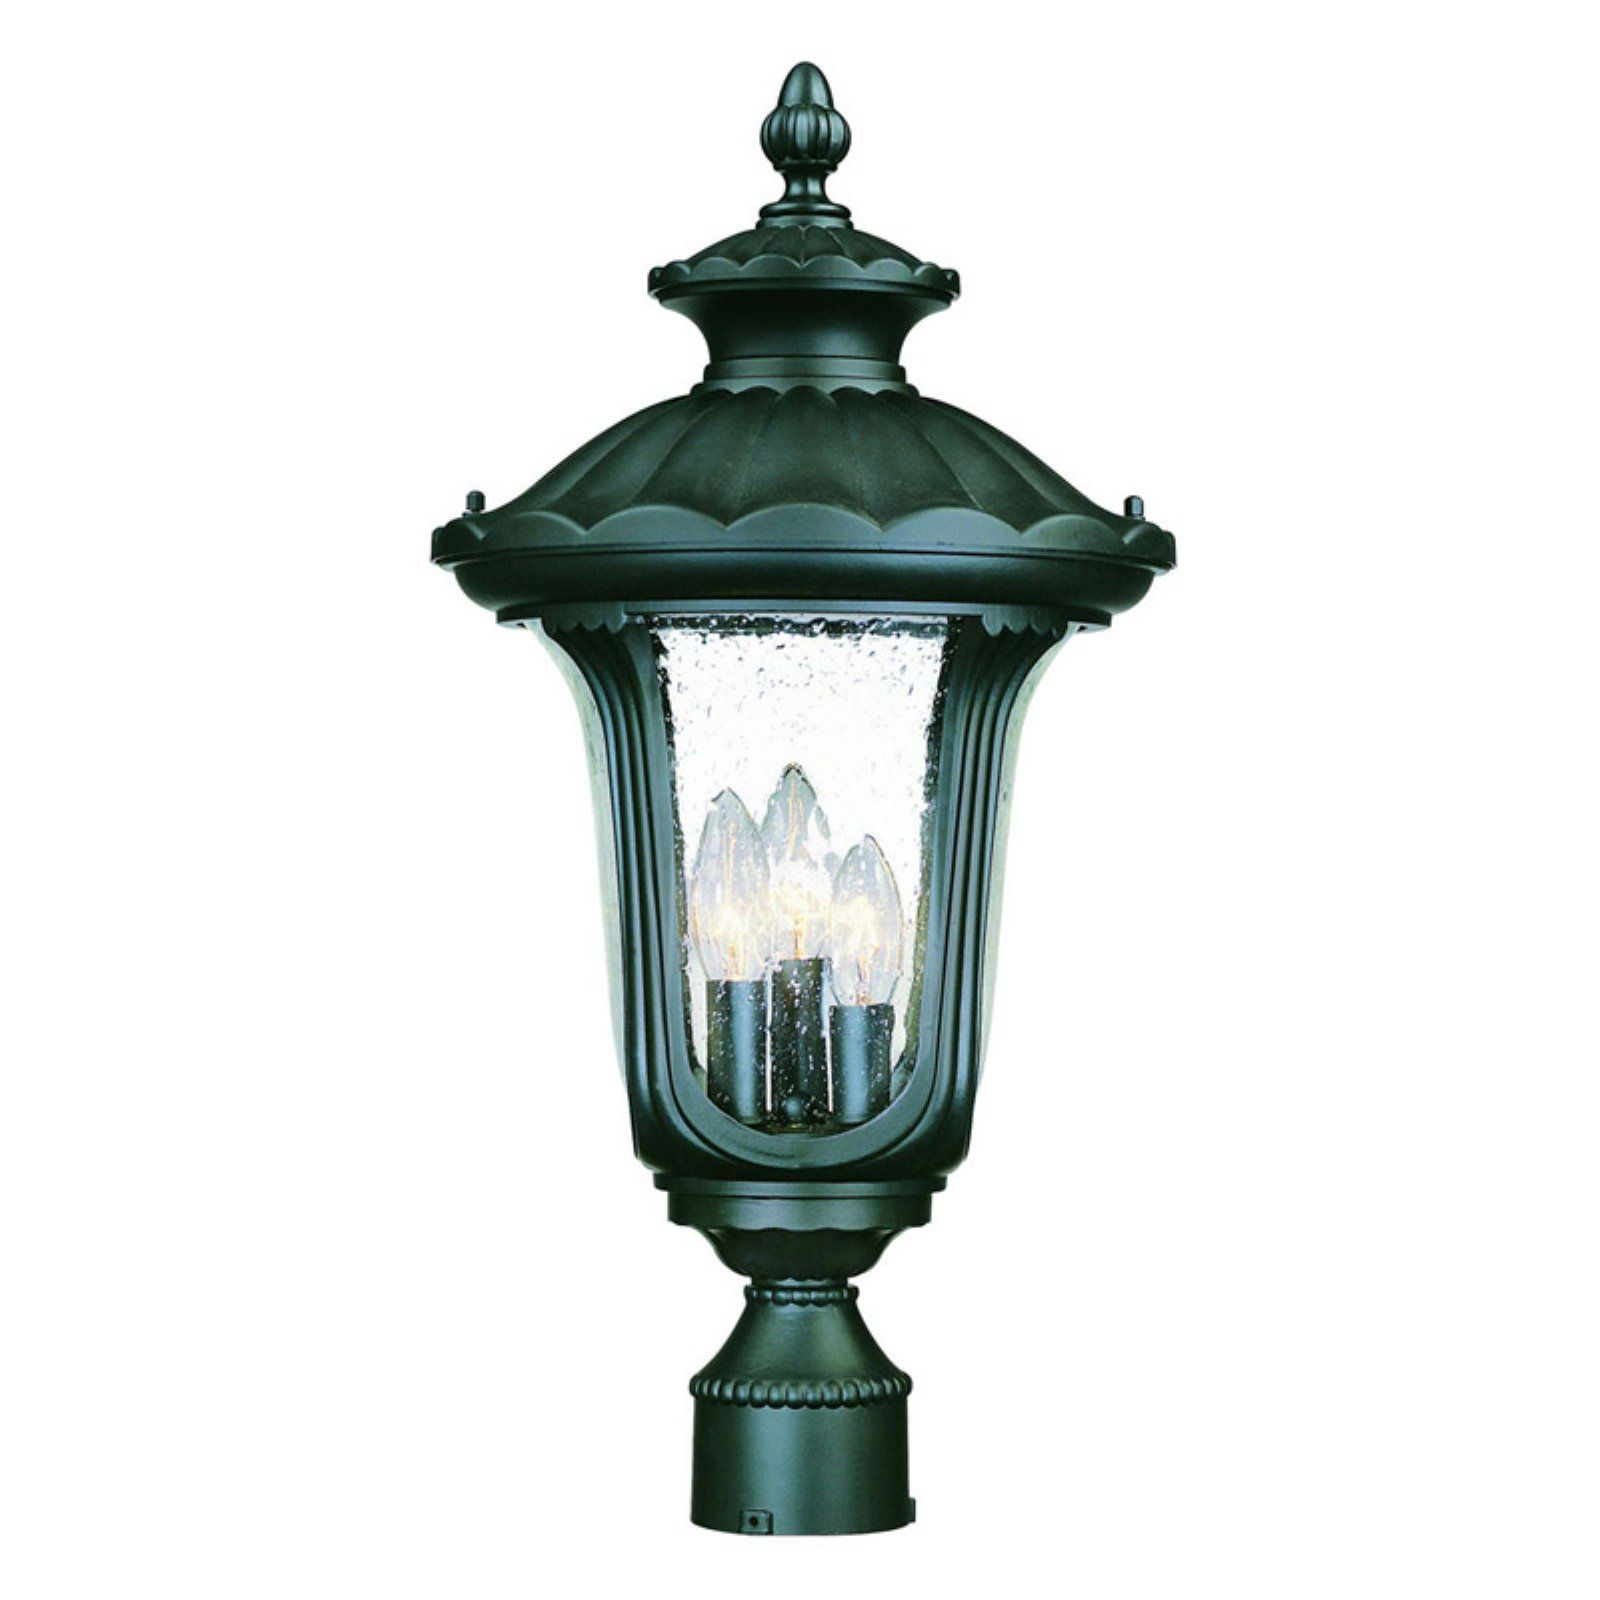 Acclaim Lighting Augusta Outdoor Post Mount Light Fixture